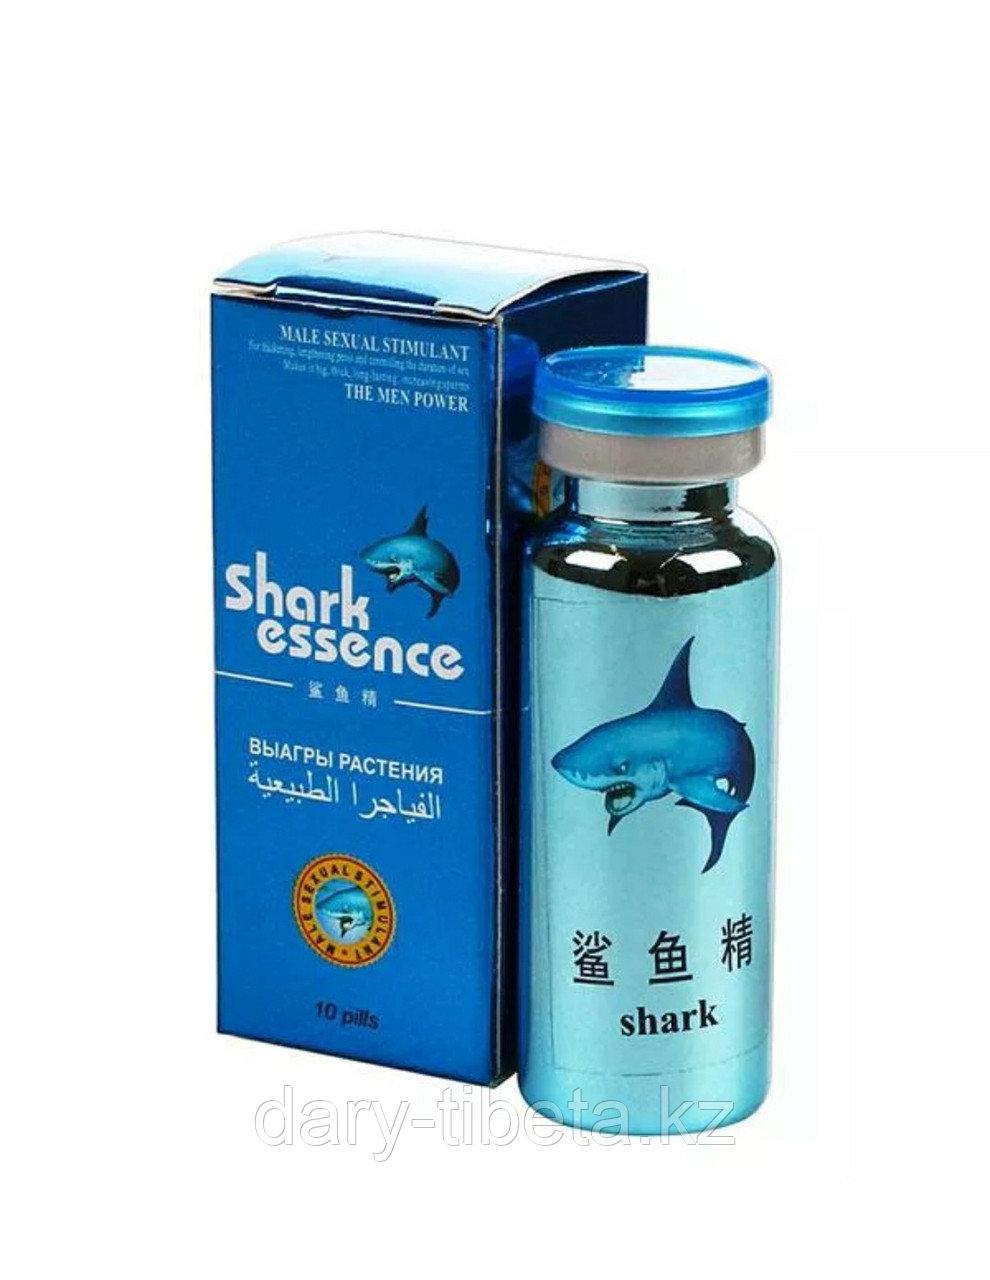 Shark essence